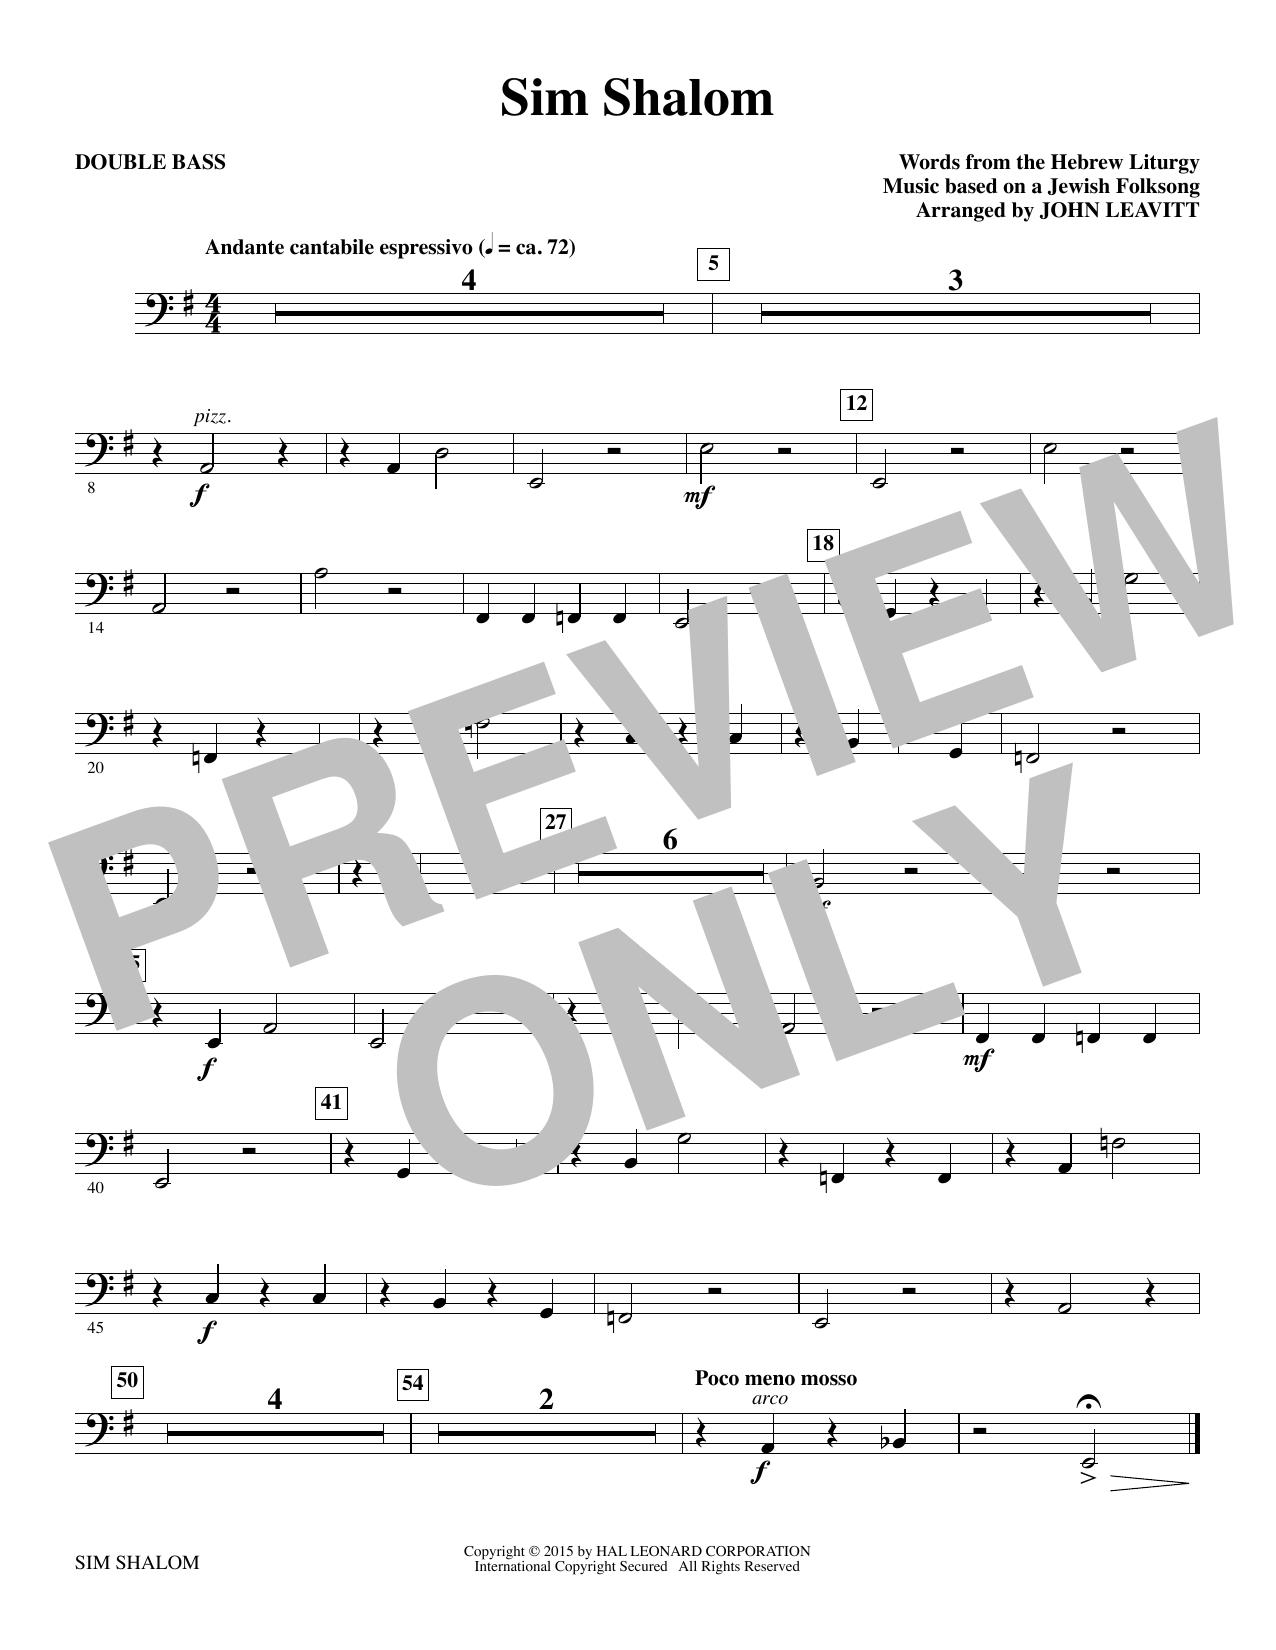 Sim Shalom - Double Bass Sheet Music